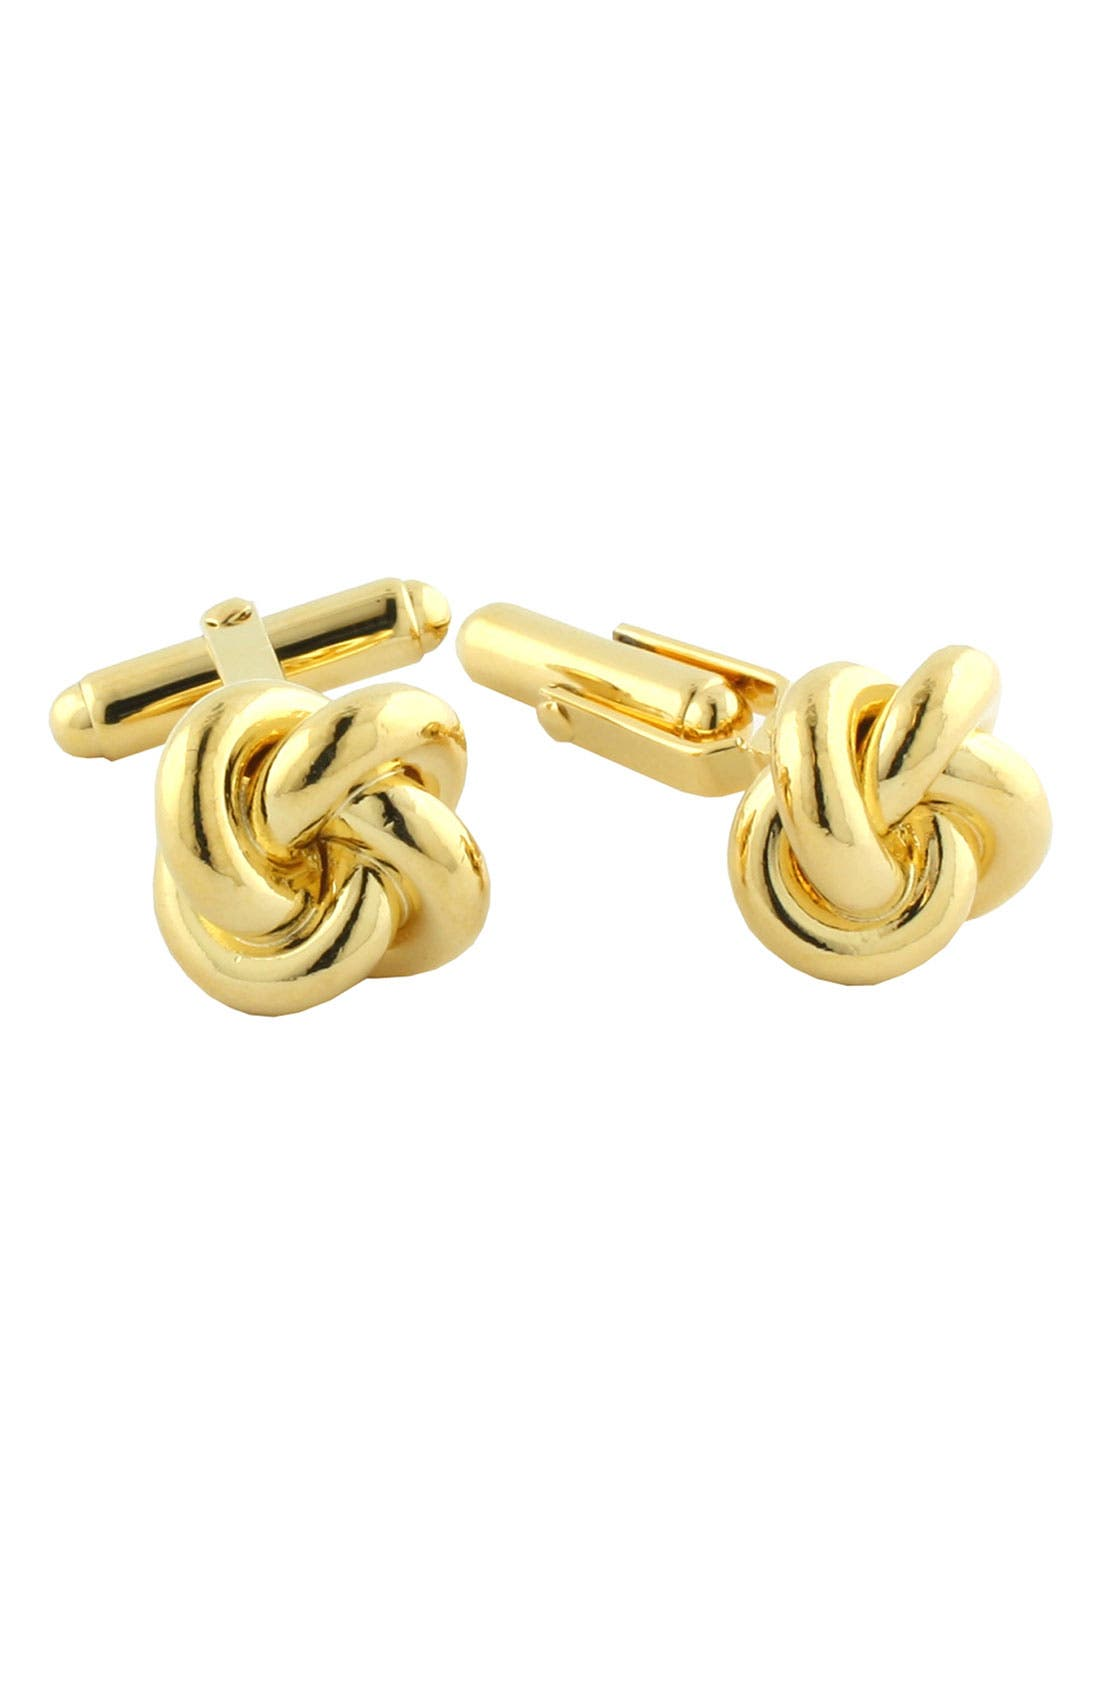 David Donahue Knot Cuff Links